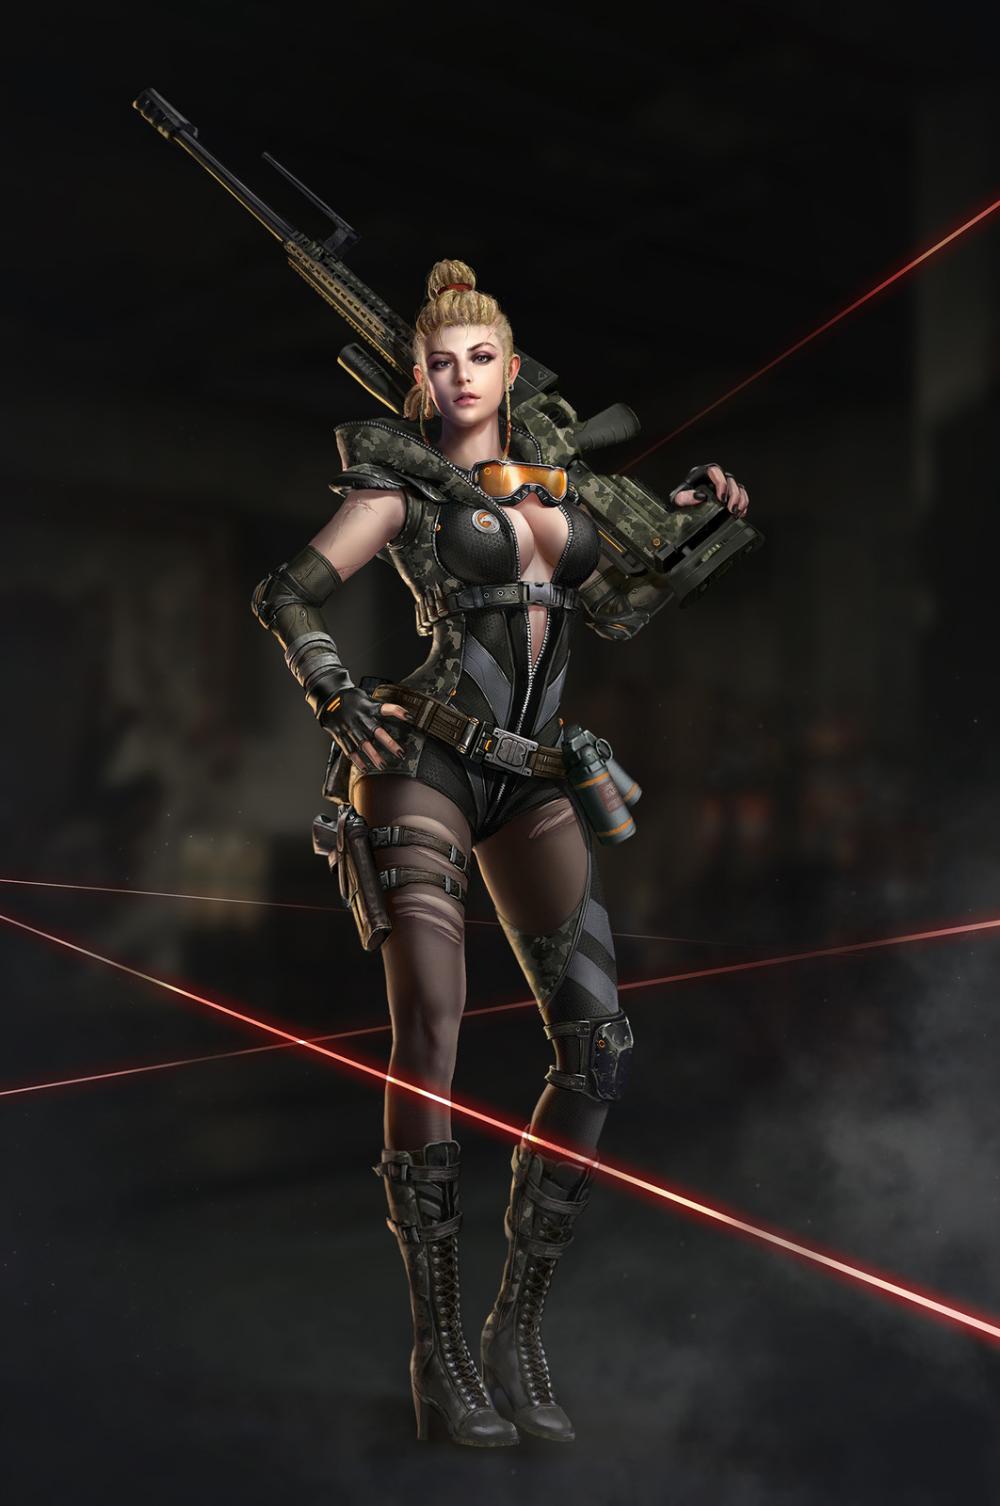 Female Sniper Art Google Search Sniper Girl Fantasy Female Warrior Warrior Woman